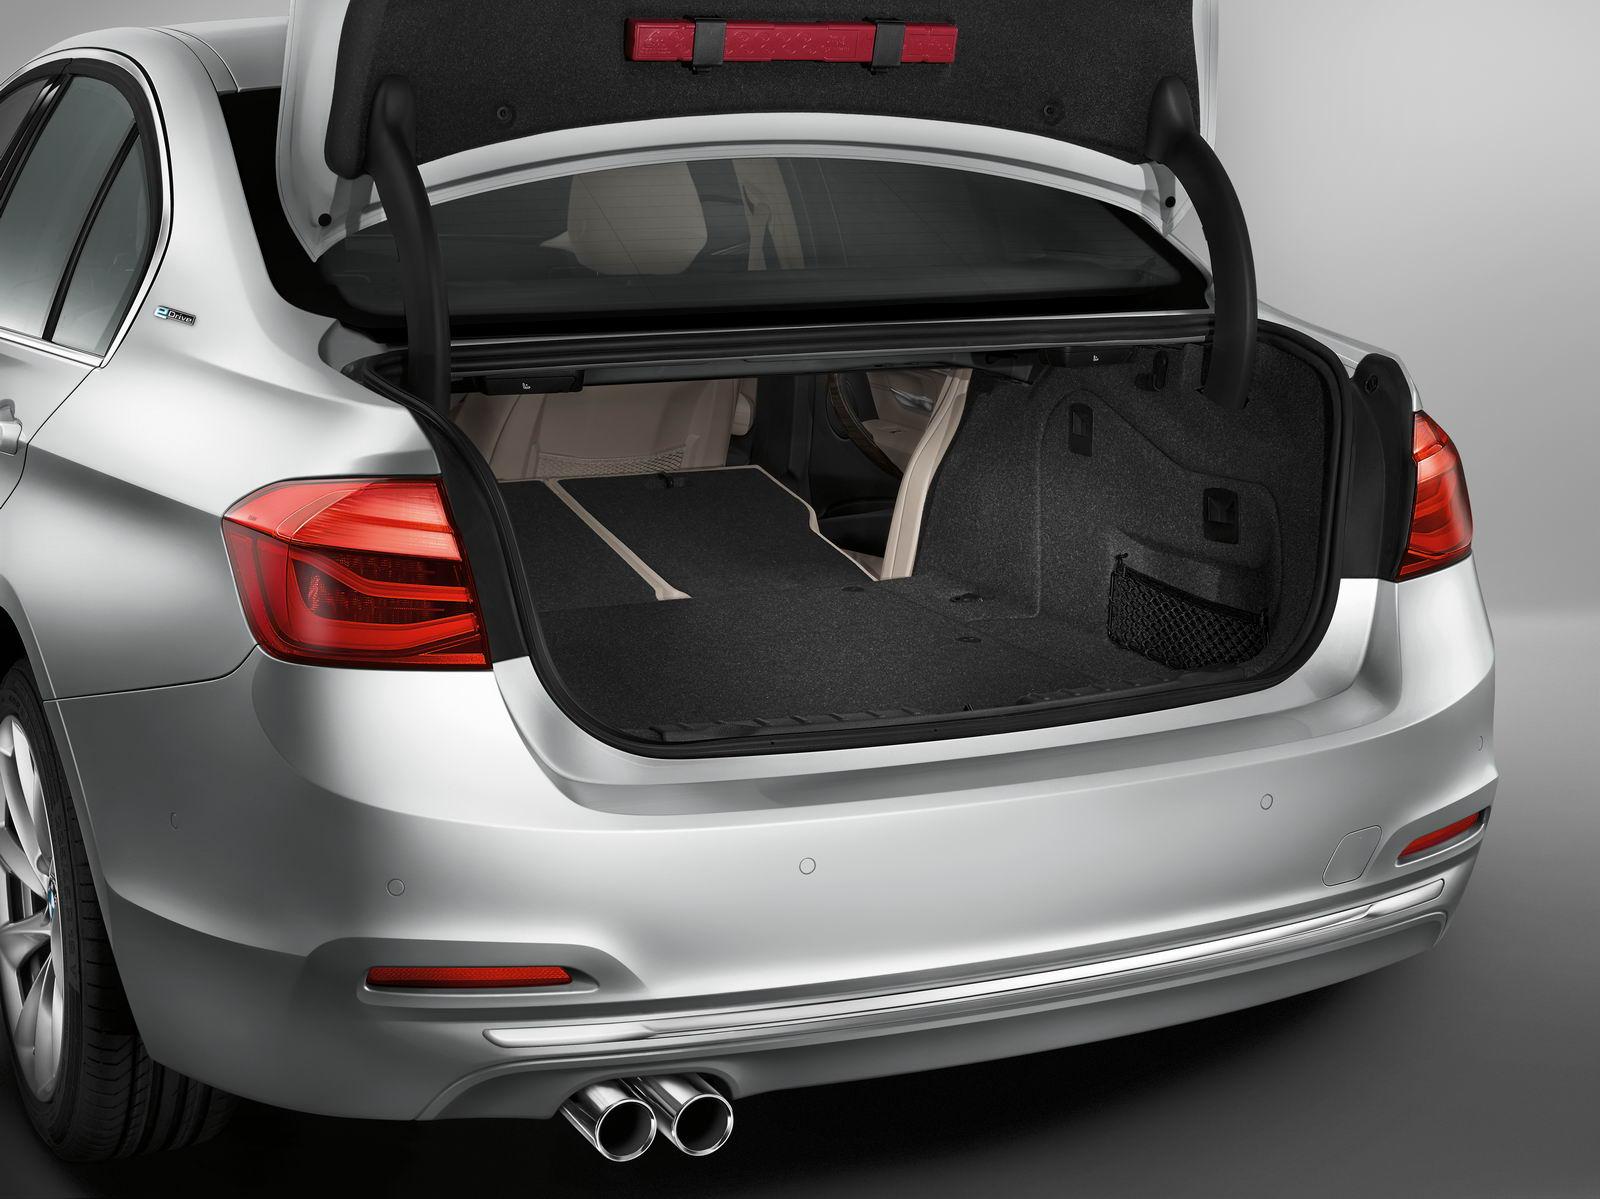 BMW 330e PHEV boot volume unveiled